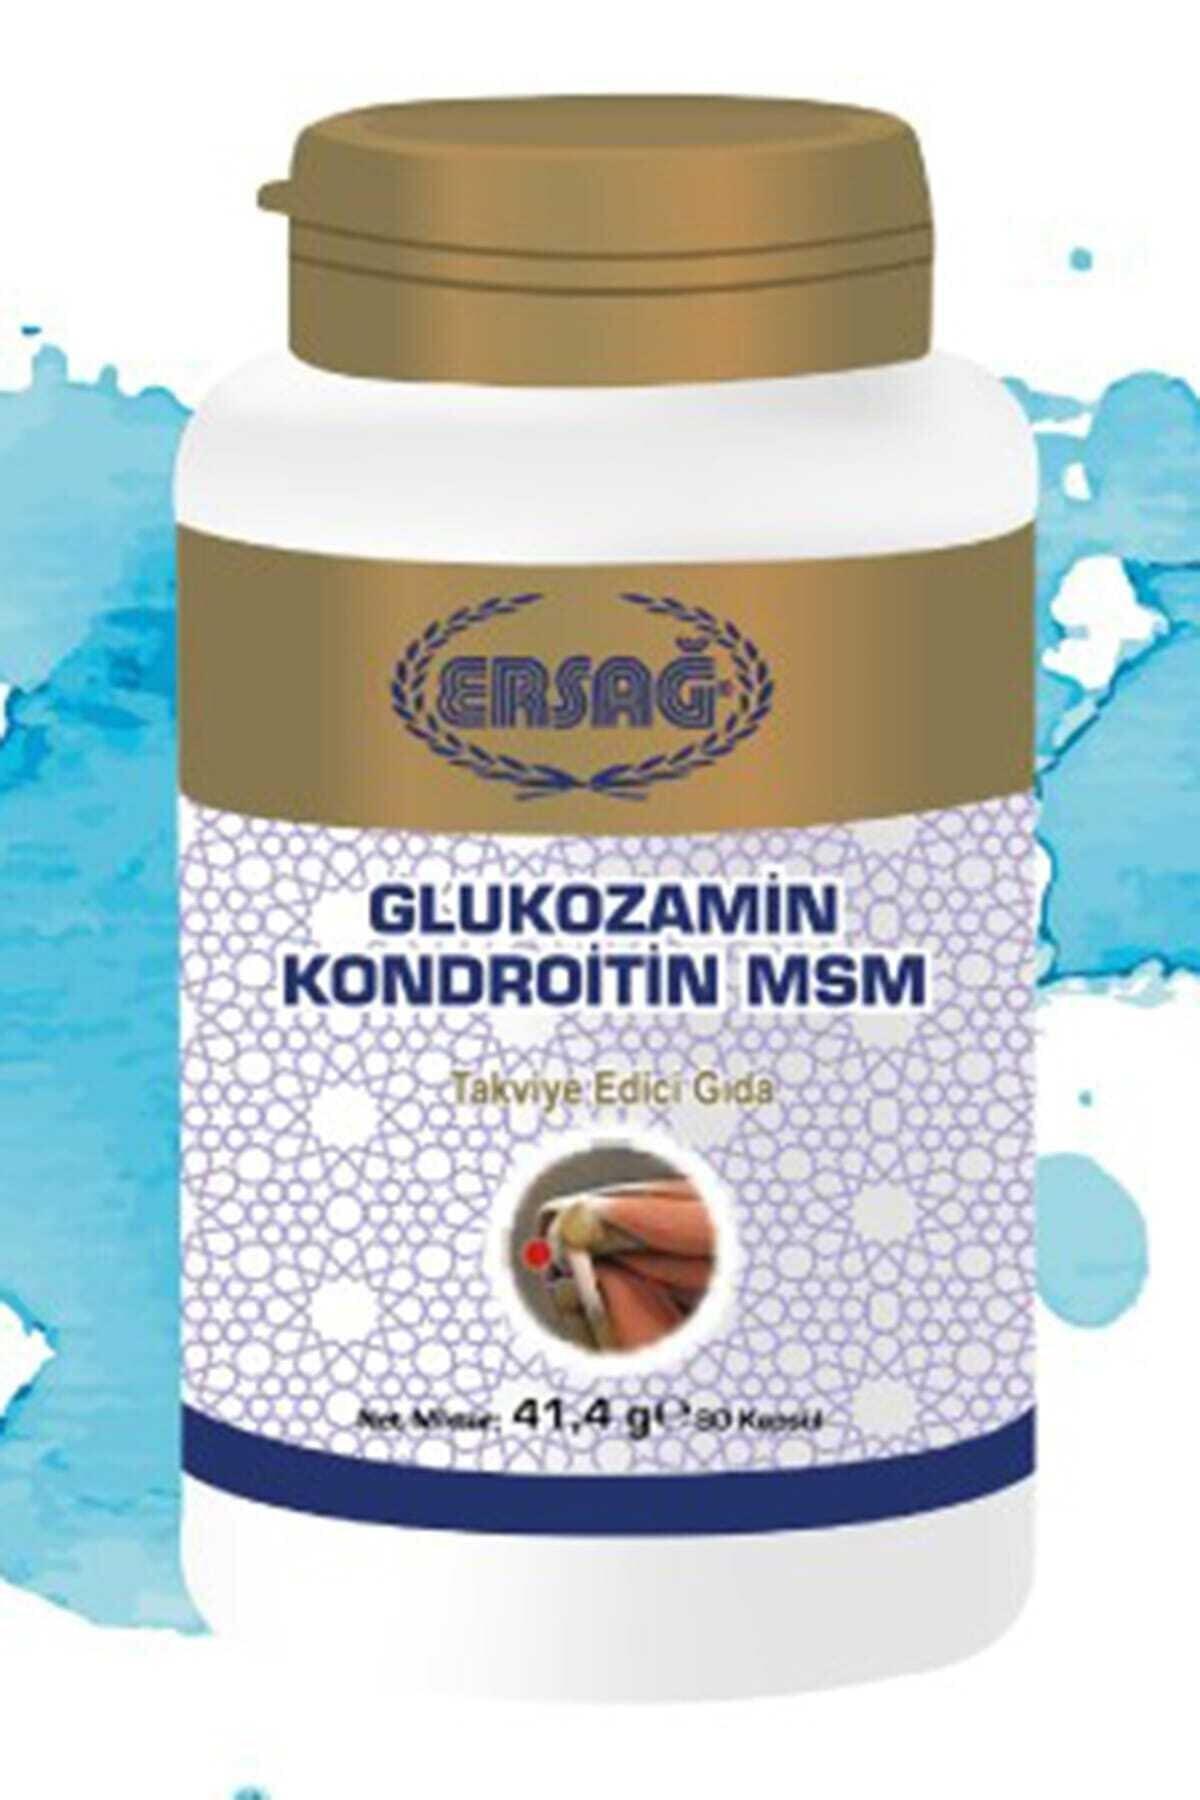 Ersağ Glukozamin Kondroitin Msm 1